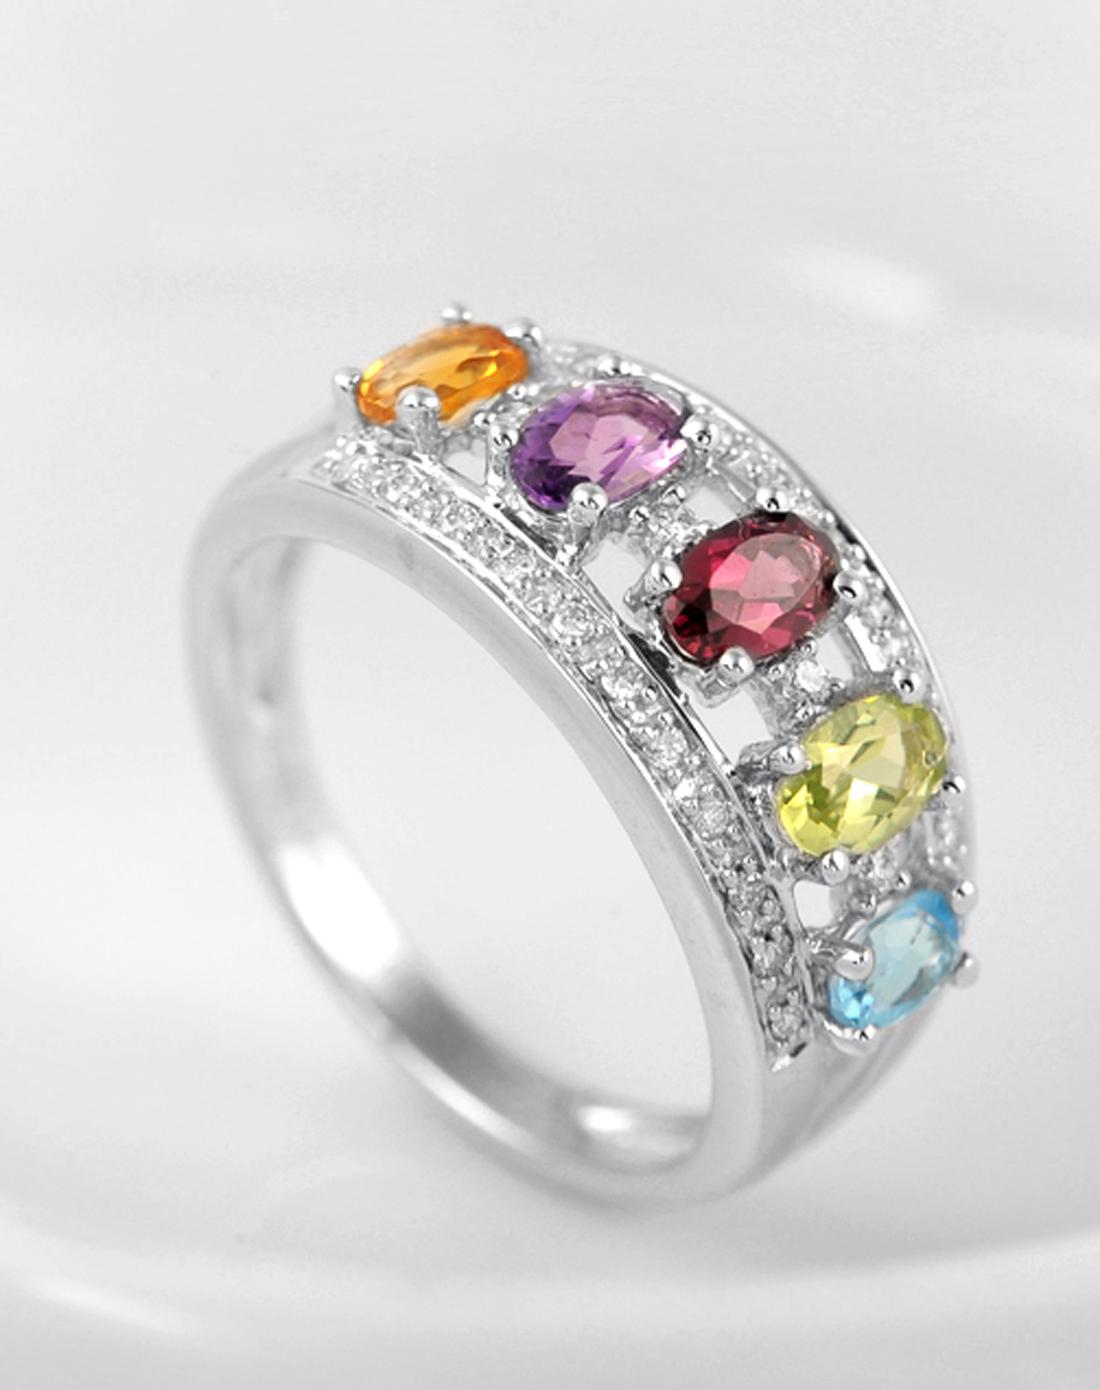 enzo珠宝专场彩虹18k金石榴石戒指er0166396w1高清图片